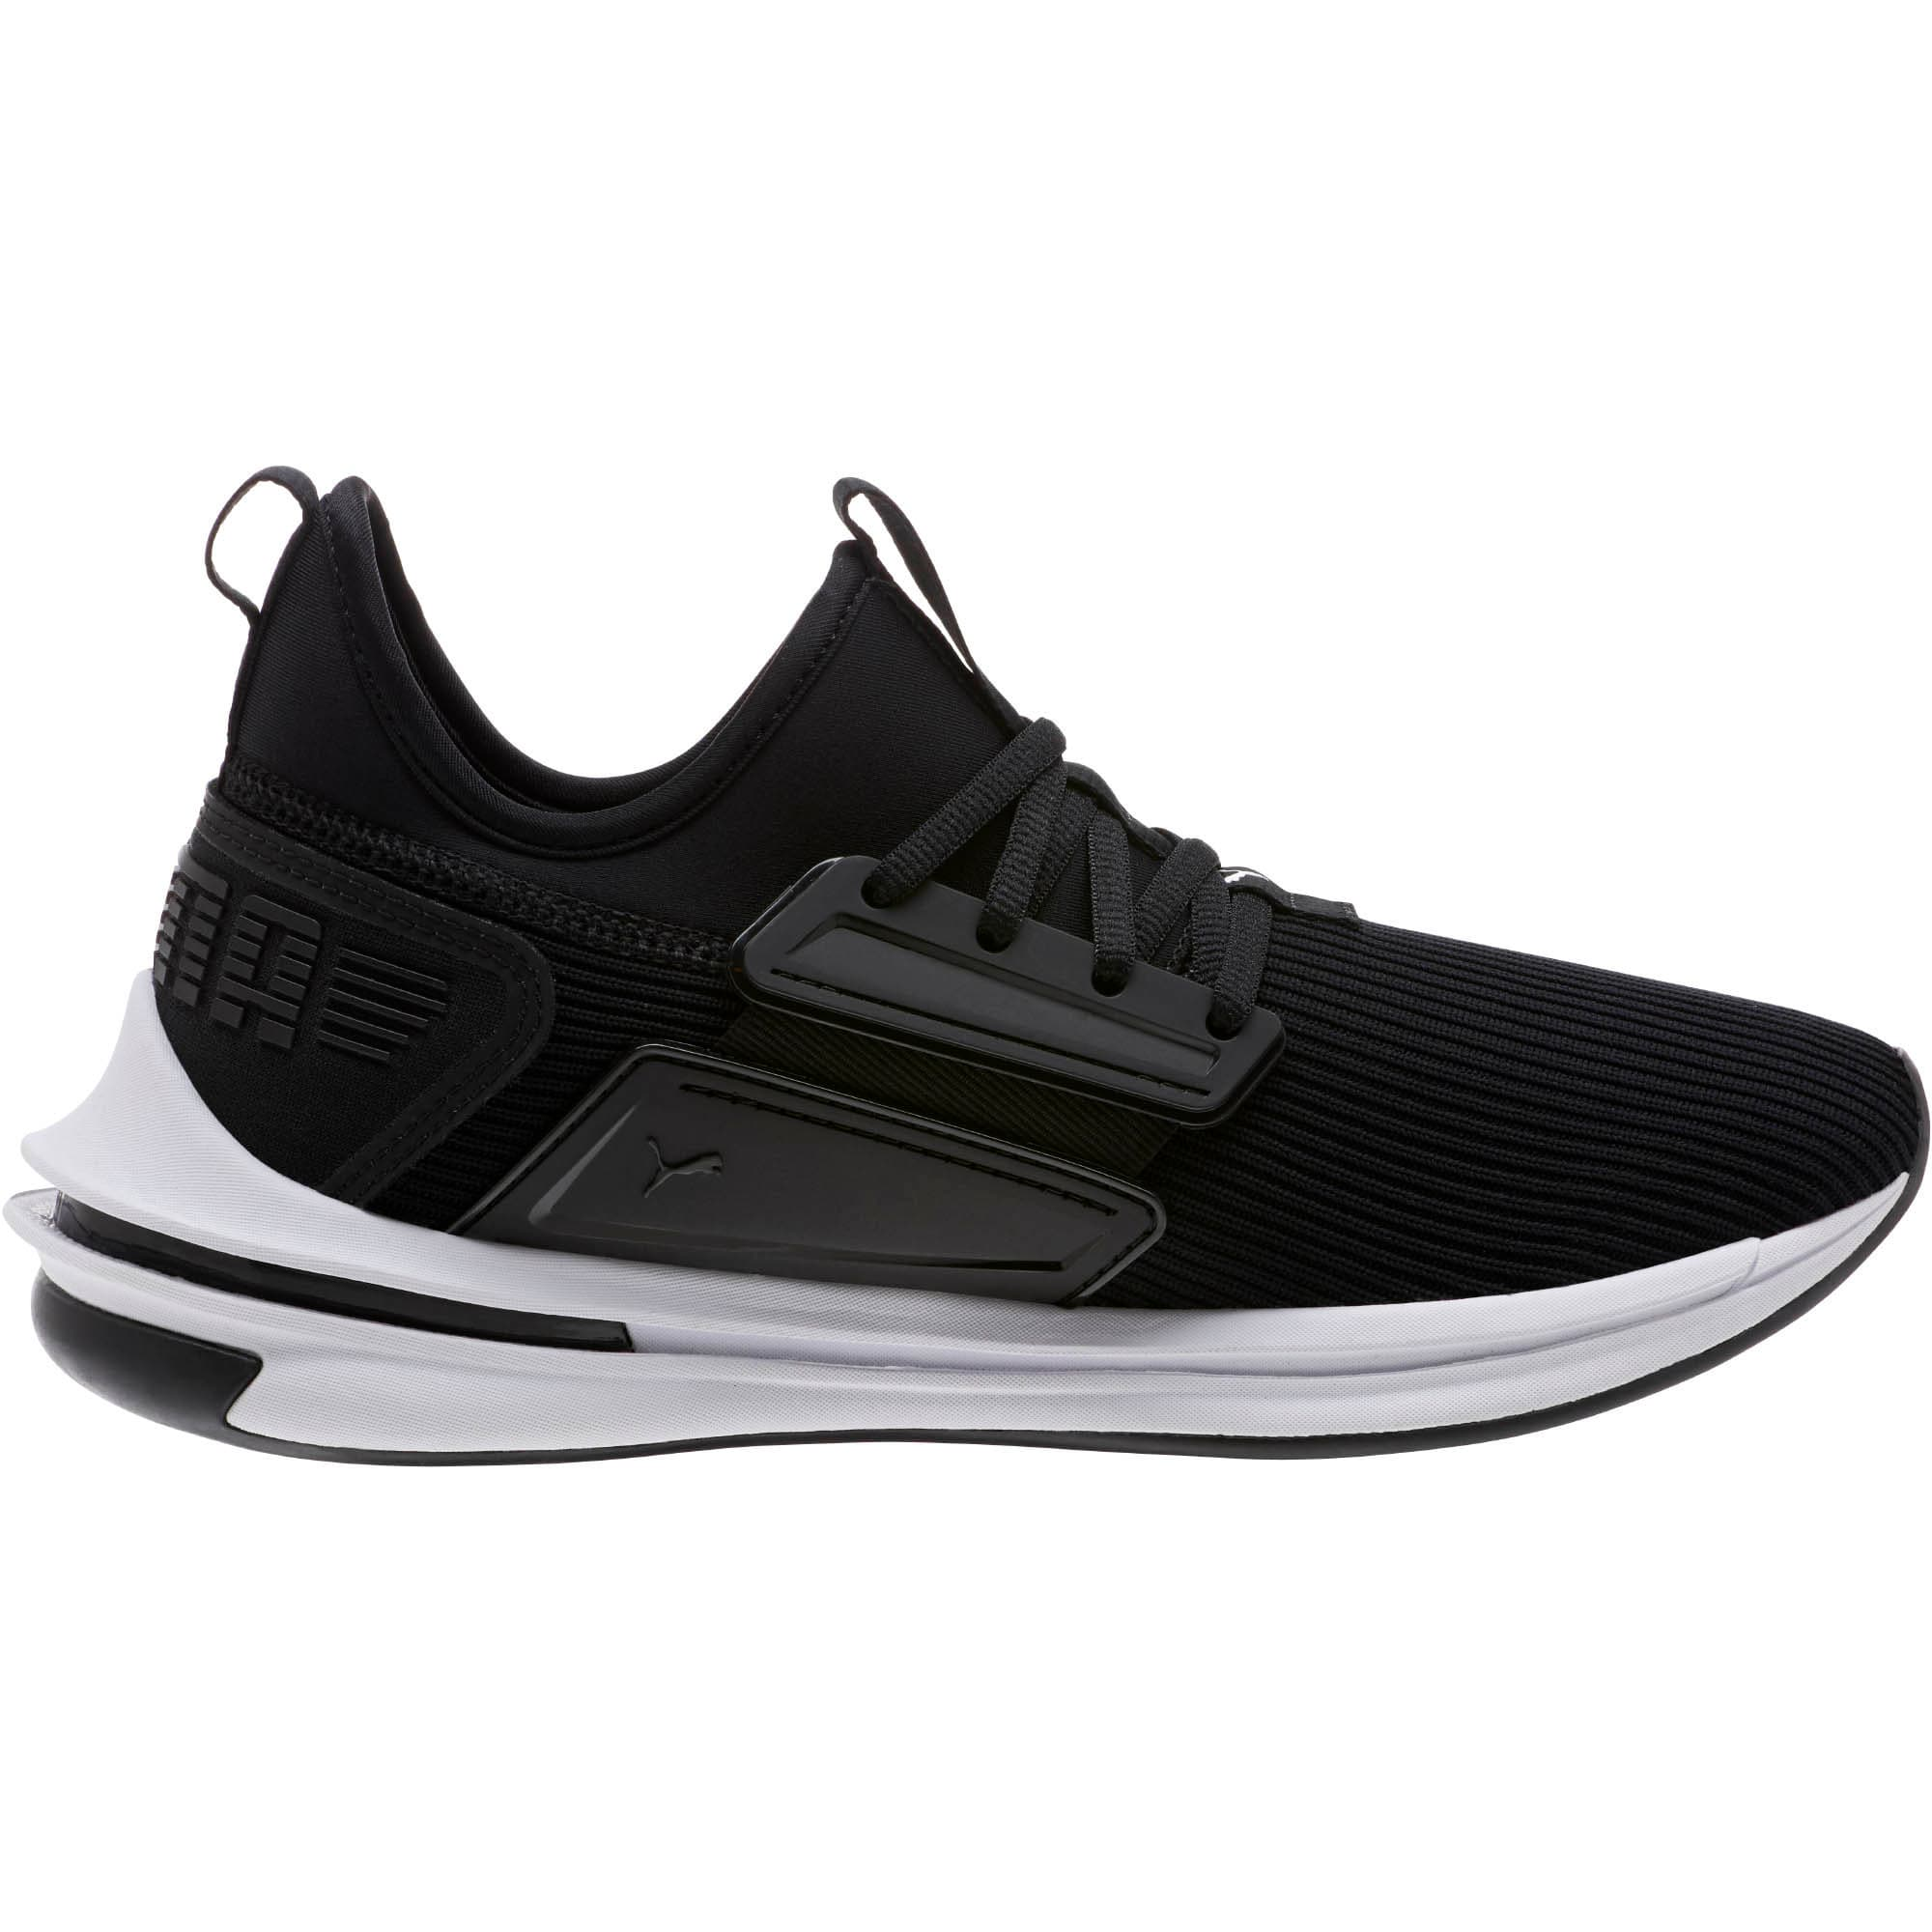 Thumbnail 3 of IGNITE Limitless Women's Running Shoes, Puma Black, medium